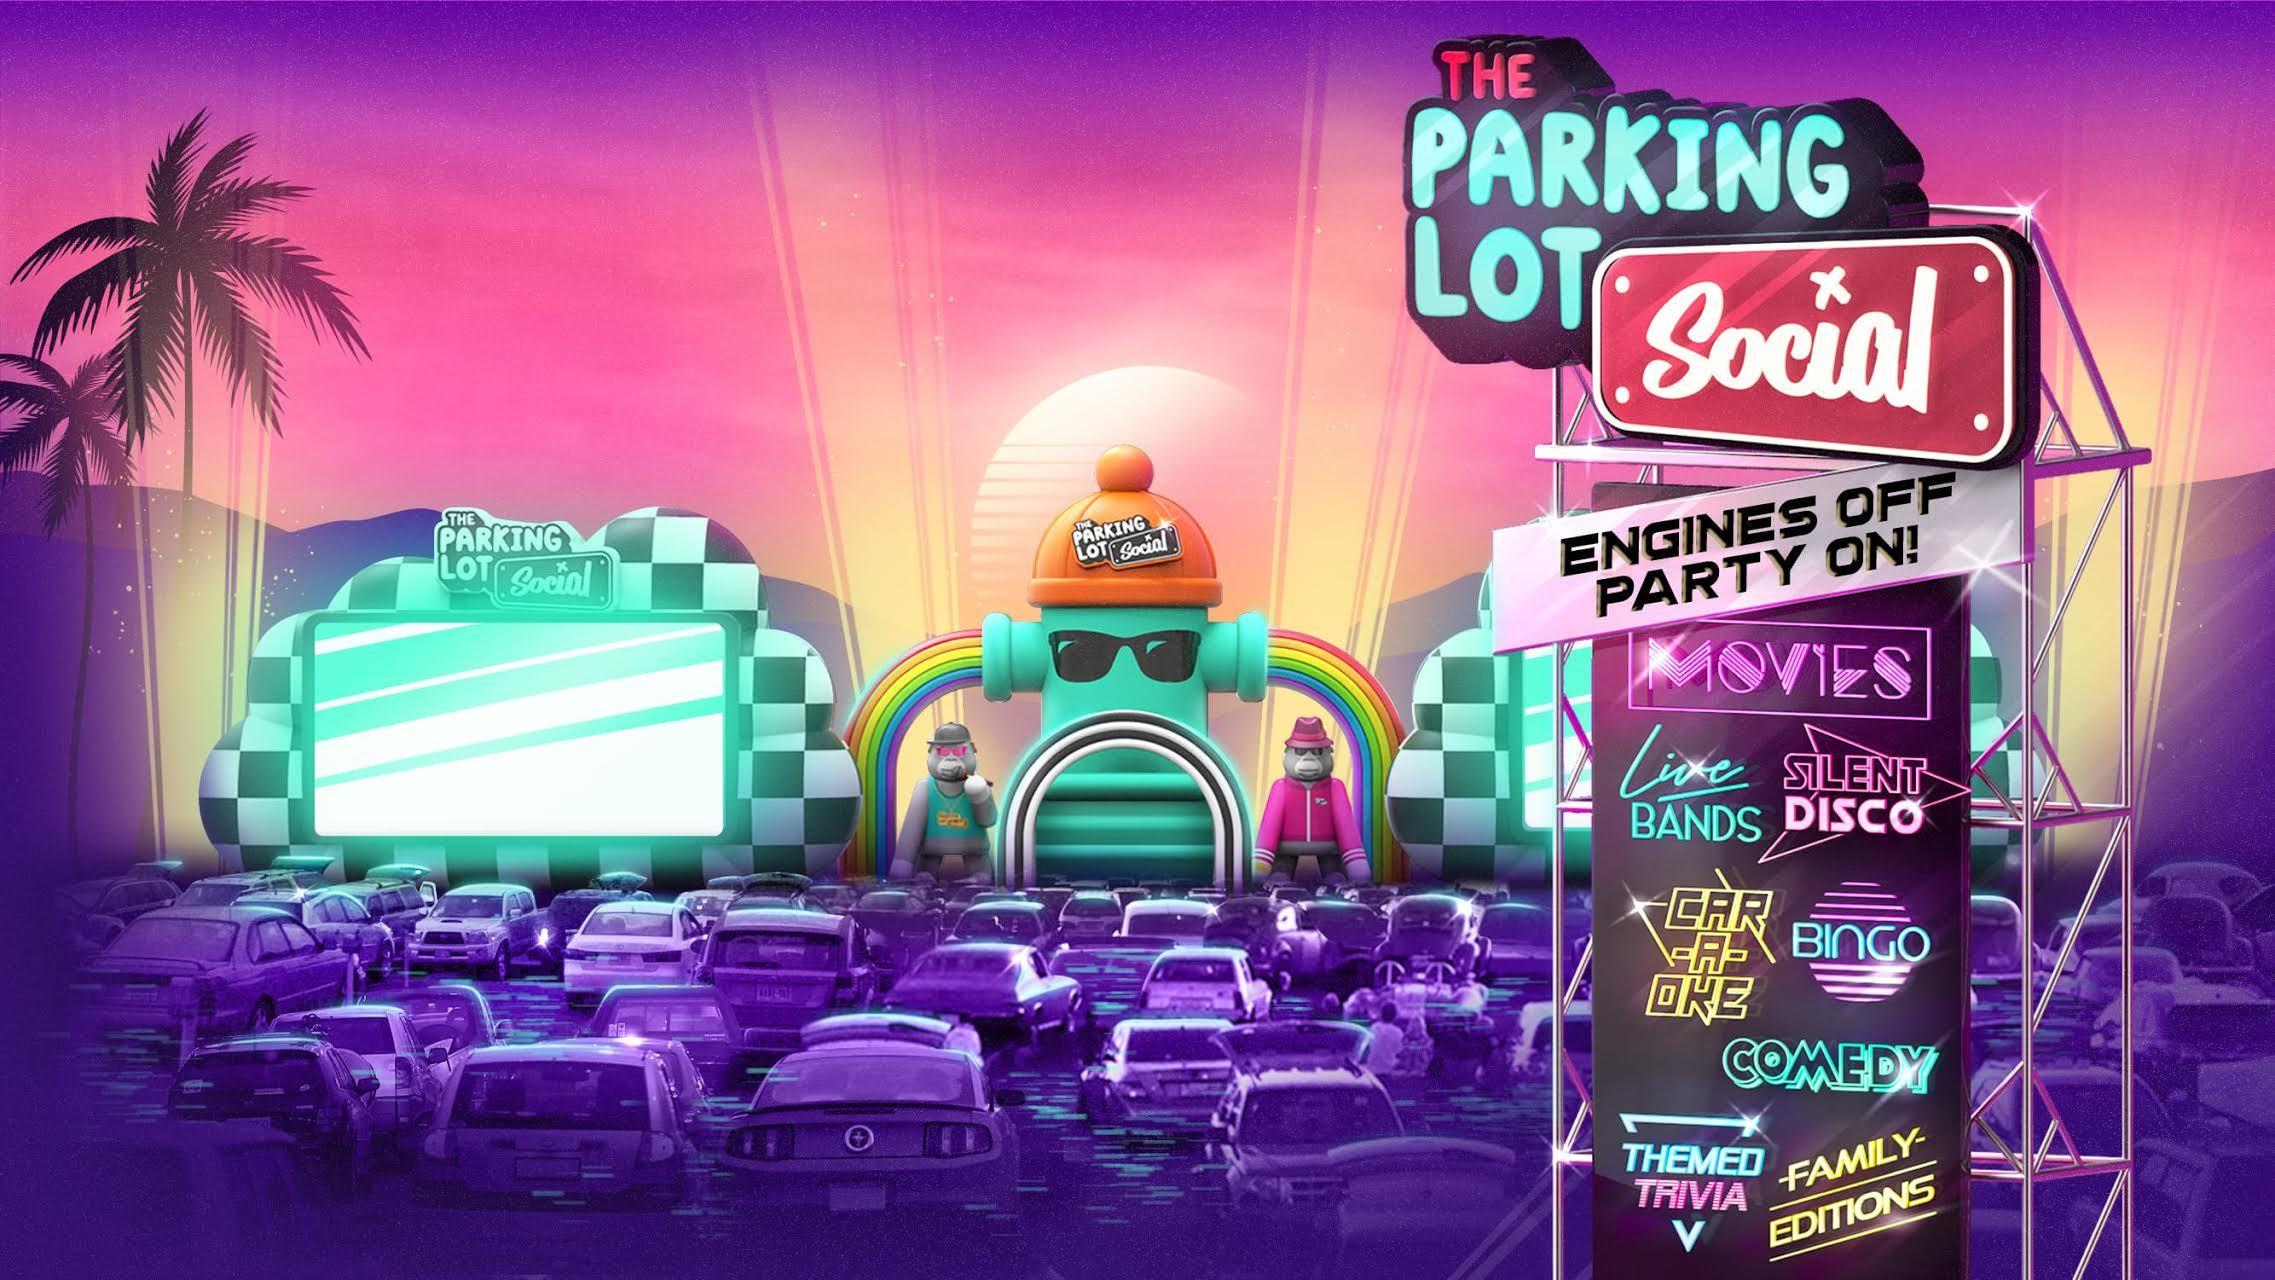 The Parking Lot Social